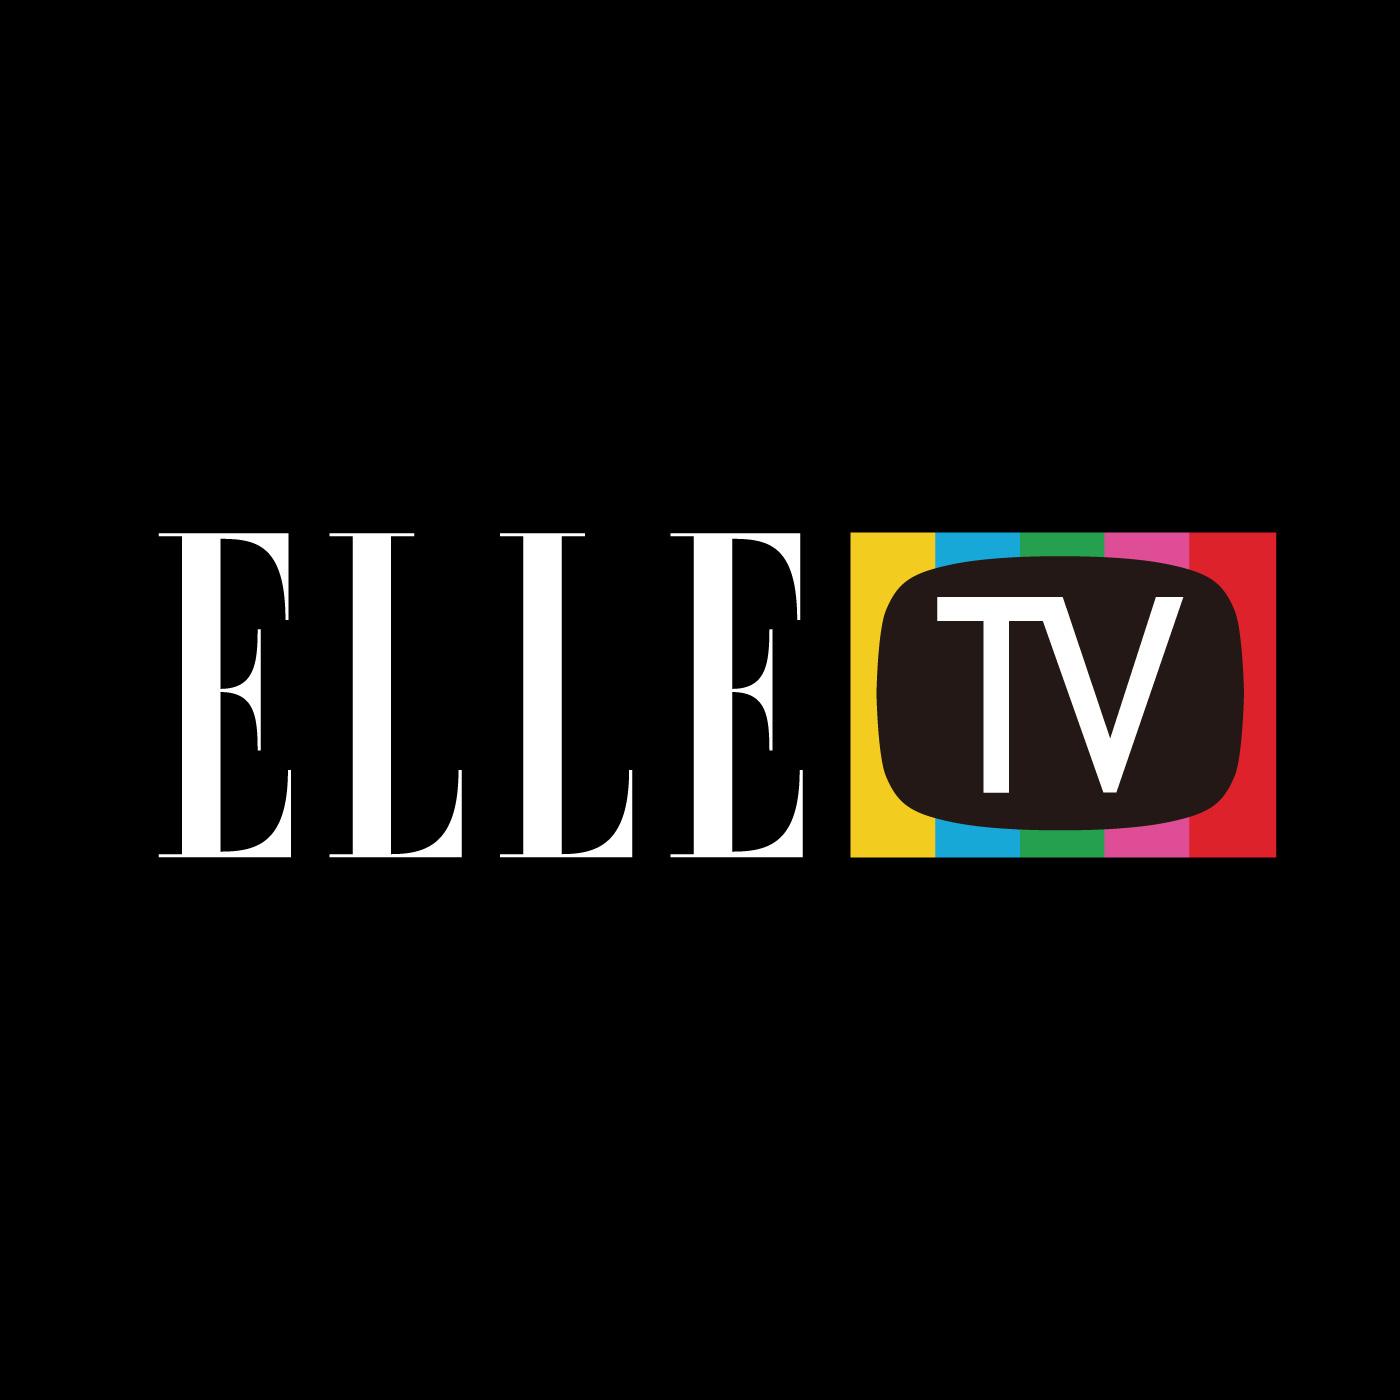 ELLE TV